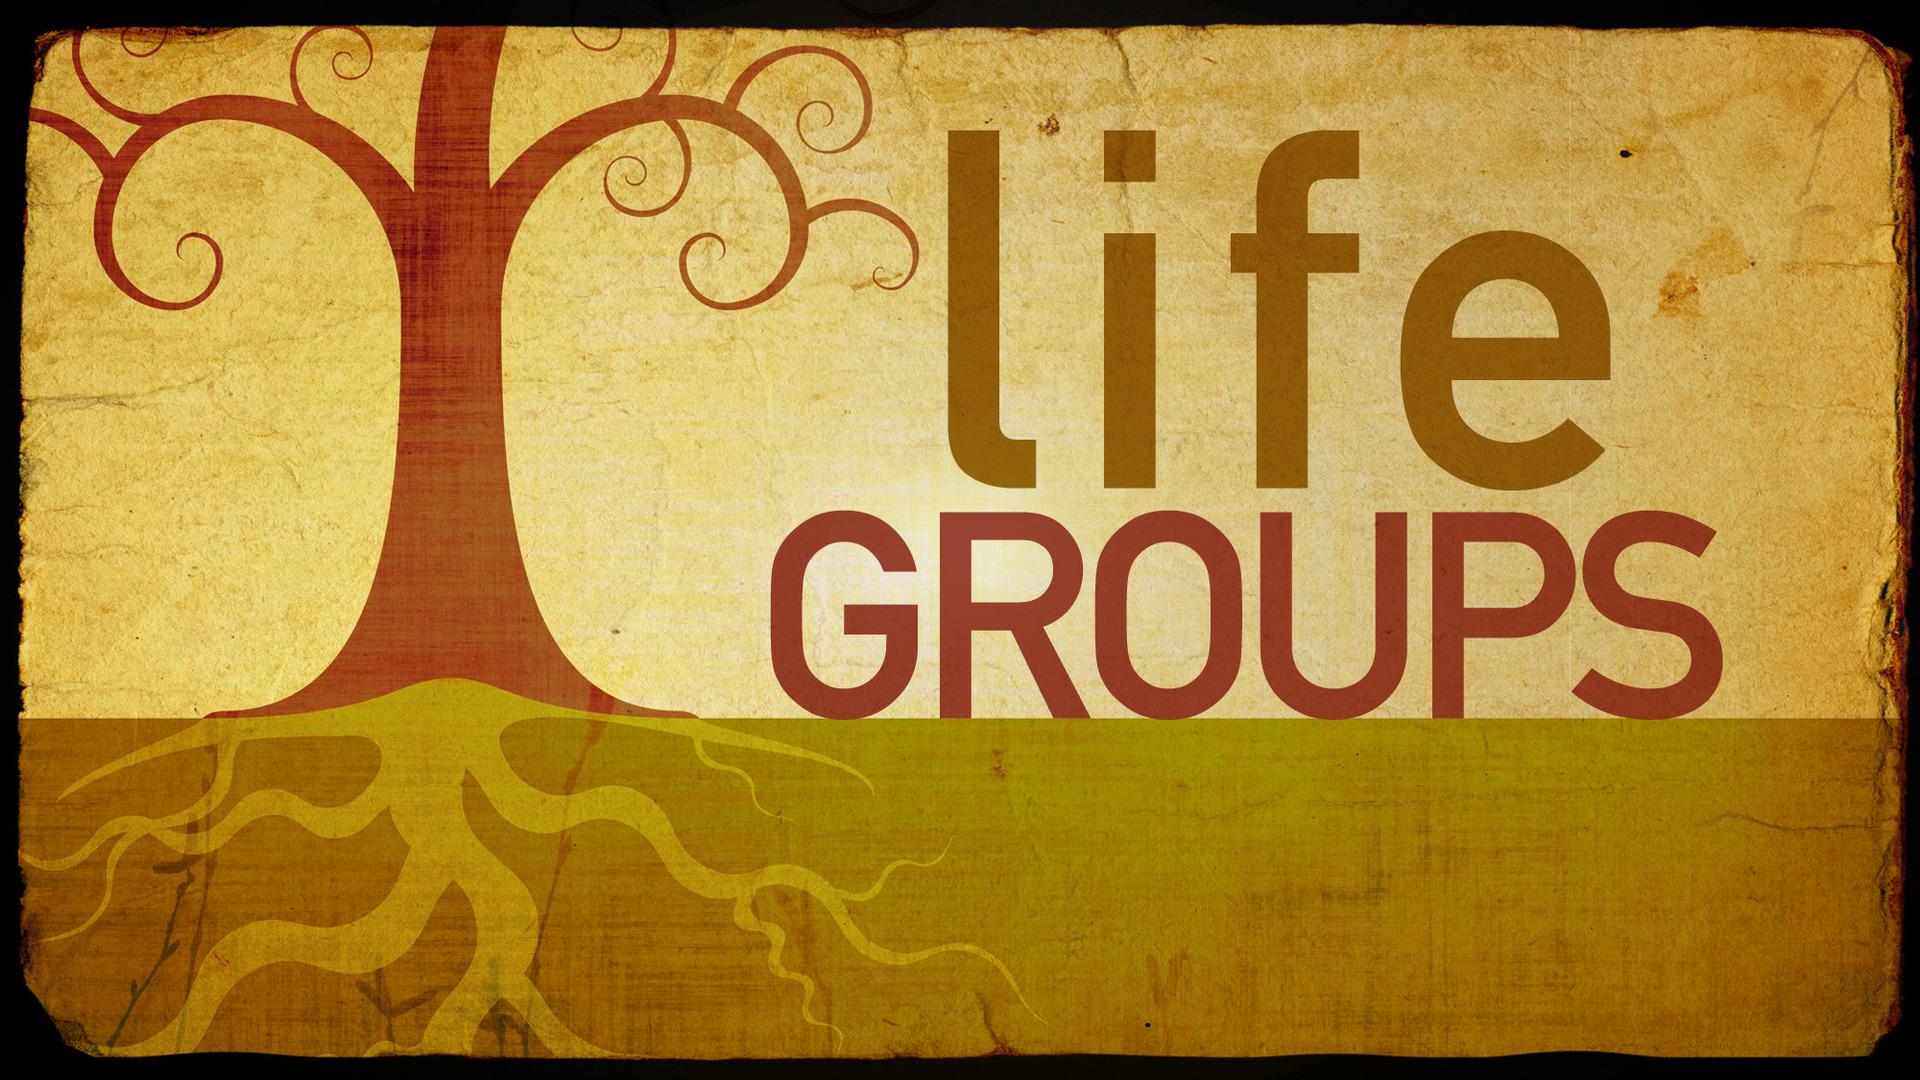 Life groups title 2 still 16x9